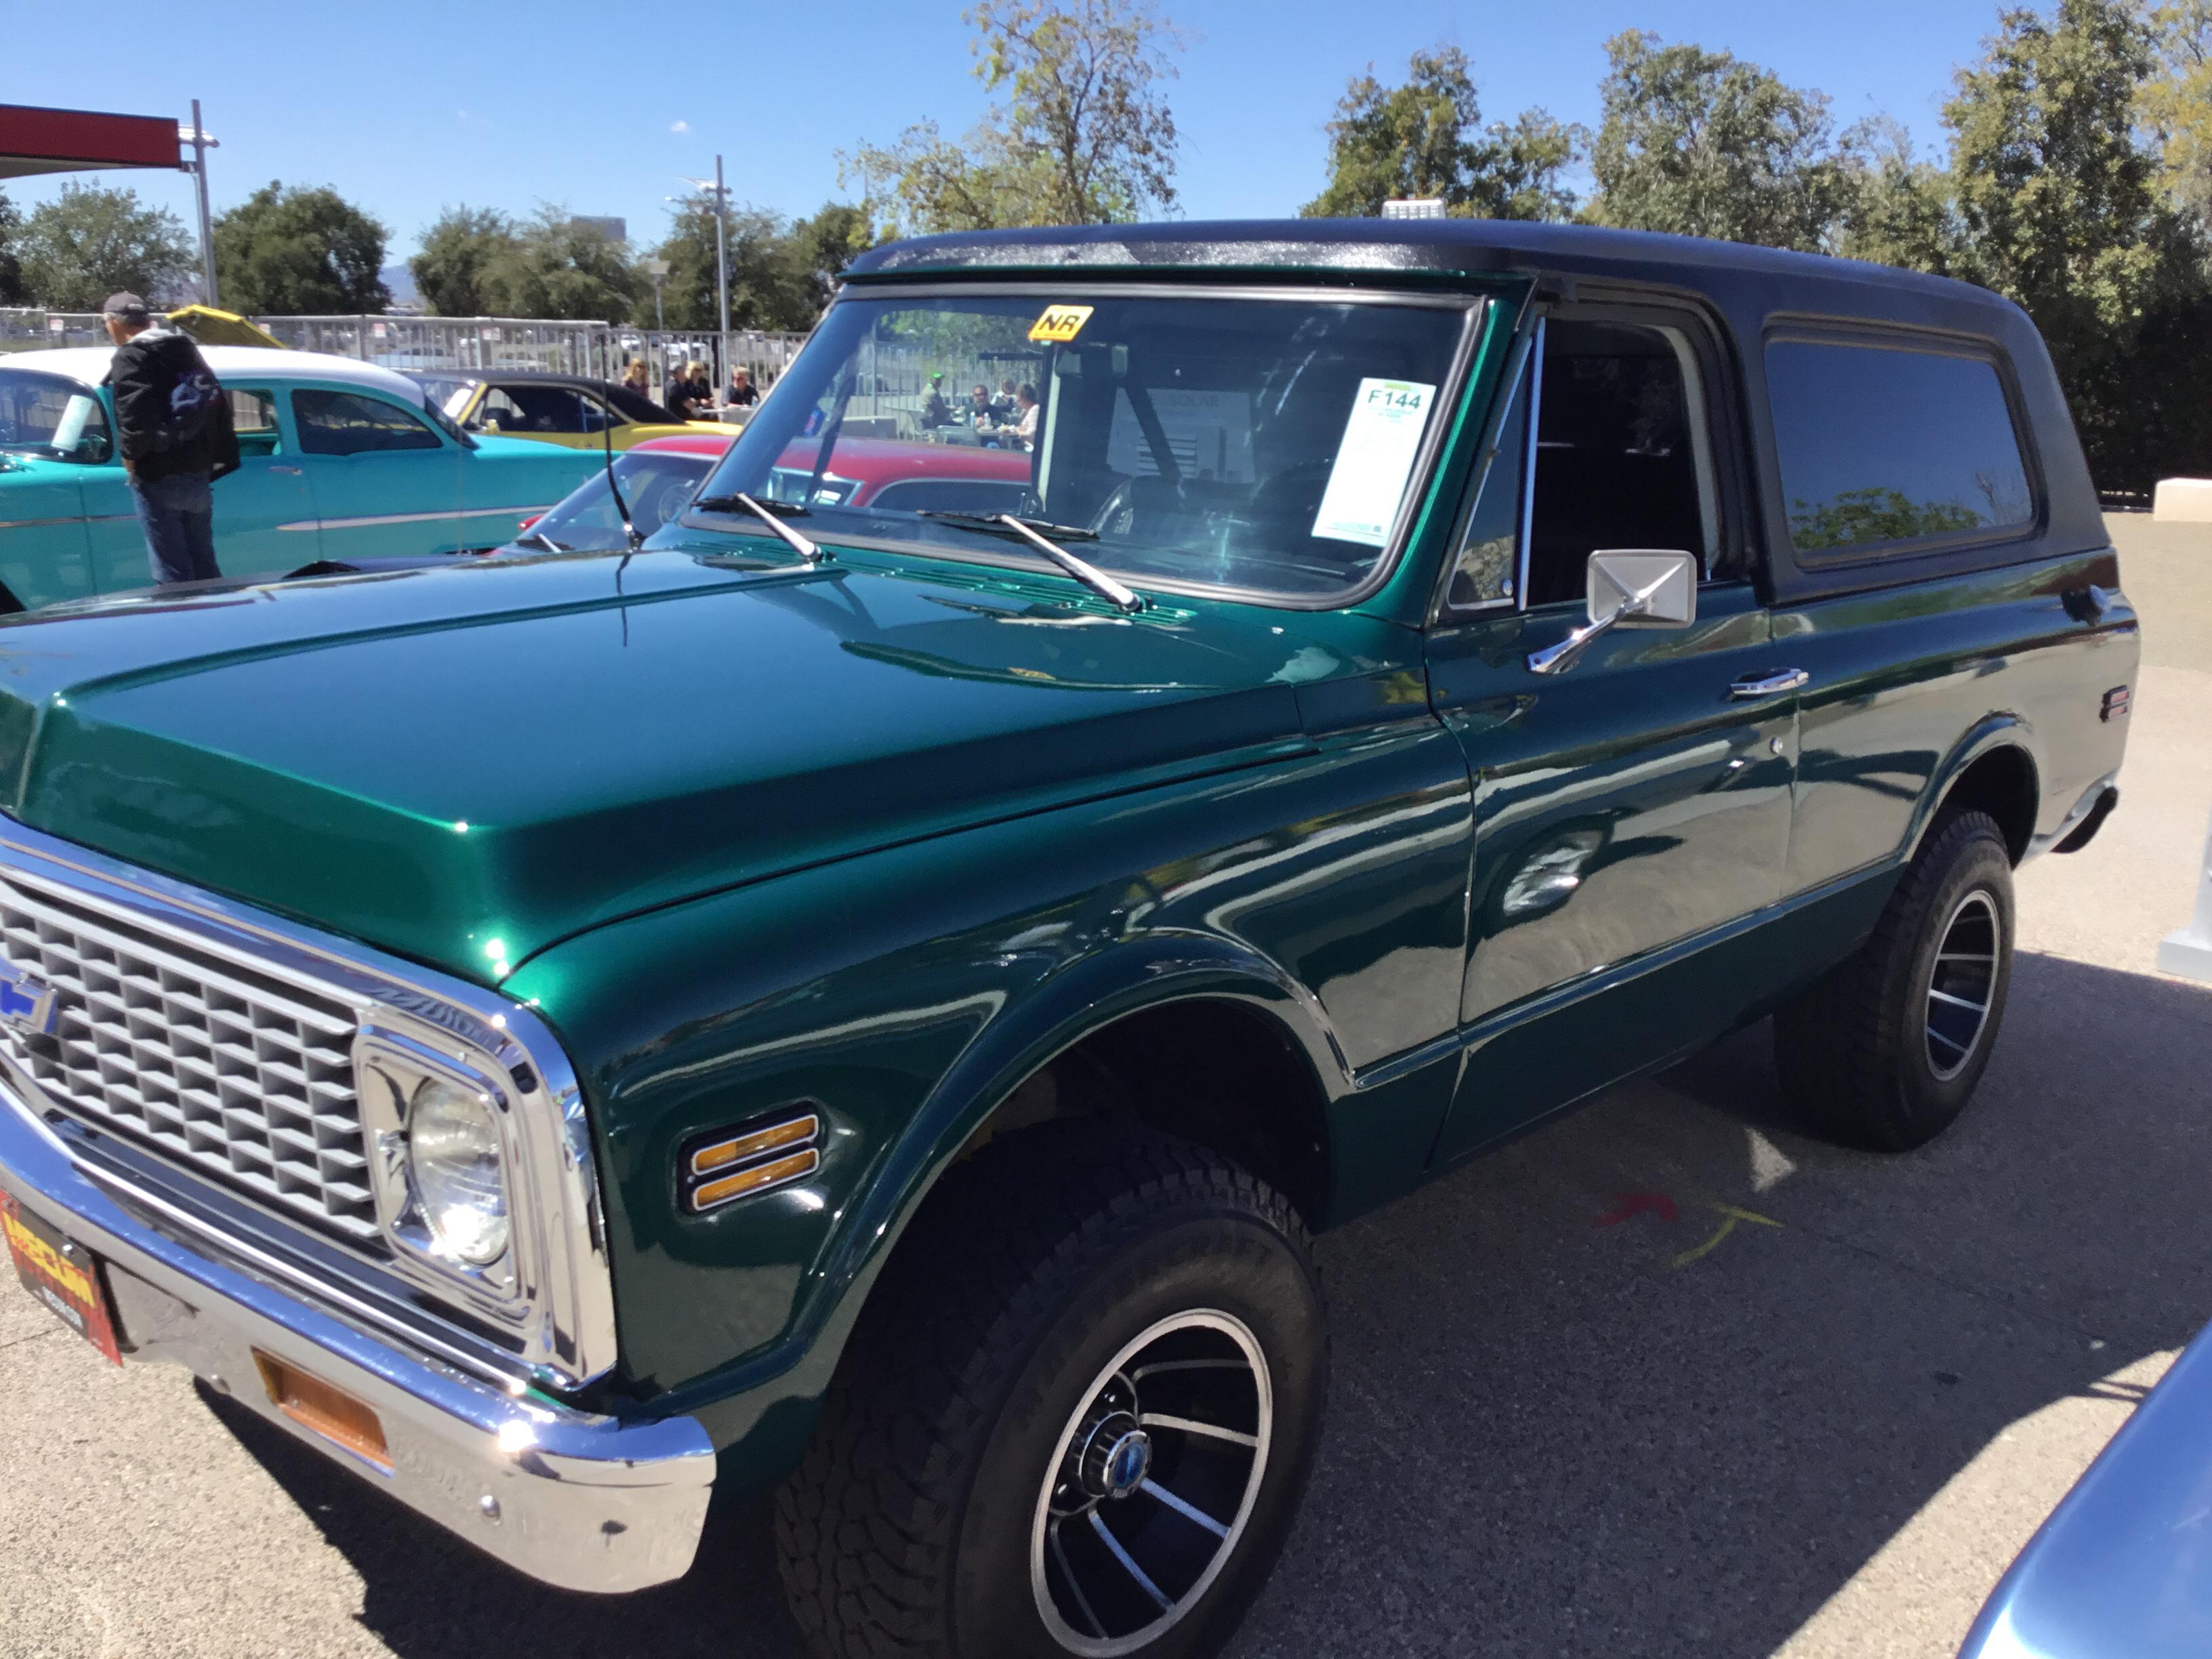 1971 Chevrolet K5 Blazer 1/2 Ton Values | Hagerty Valuation Tool®